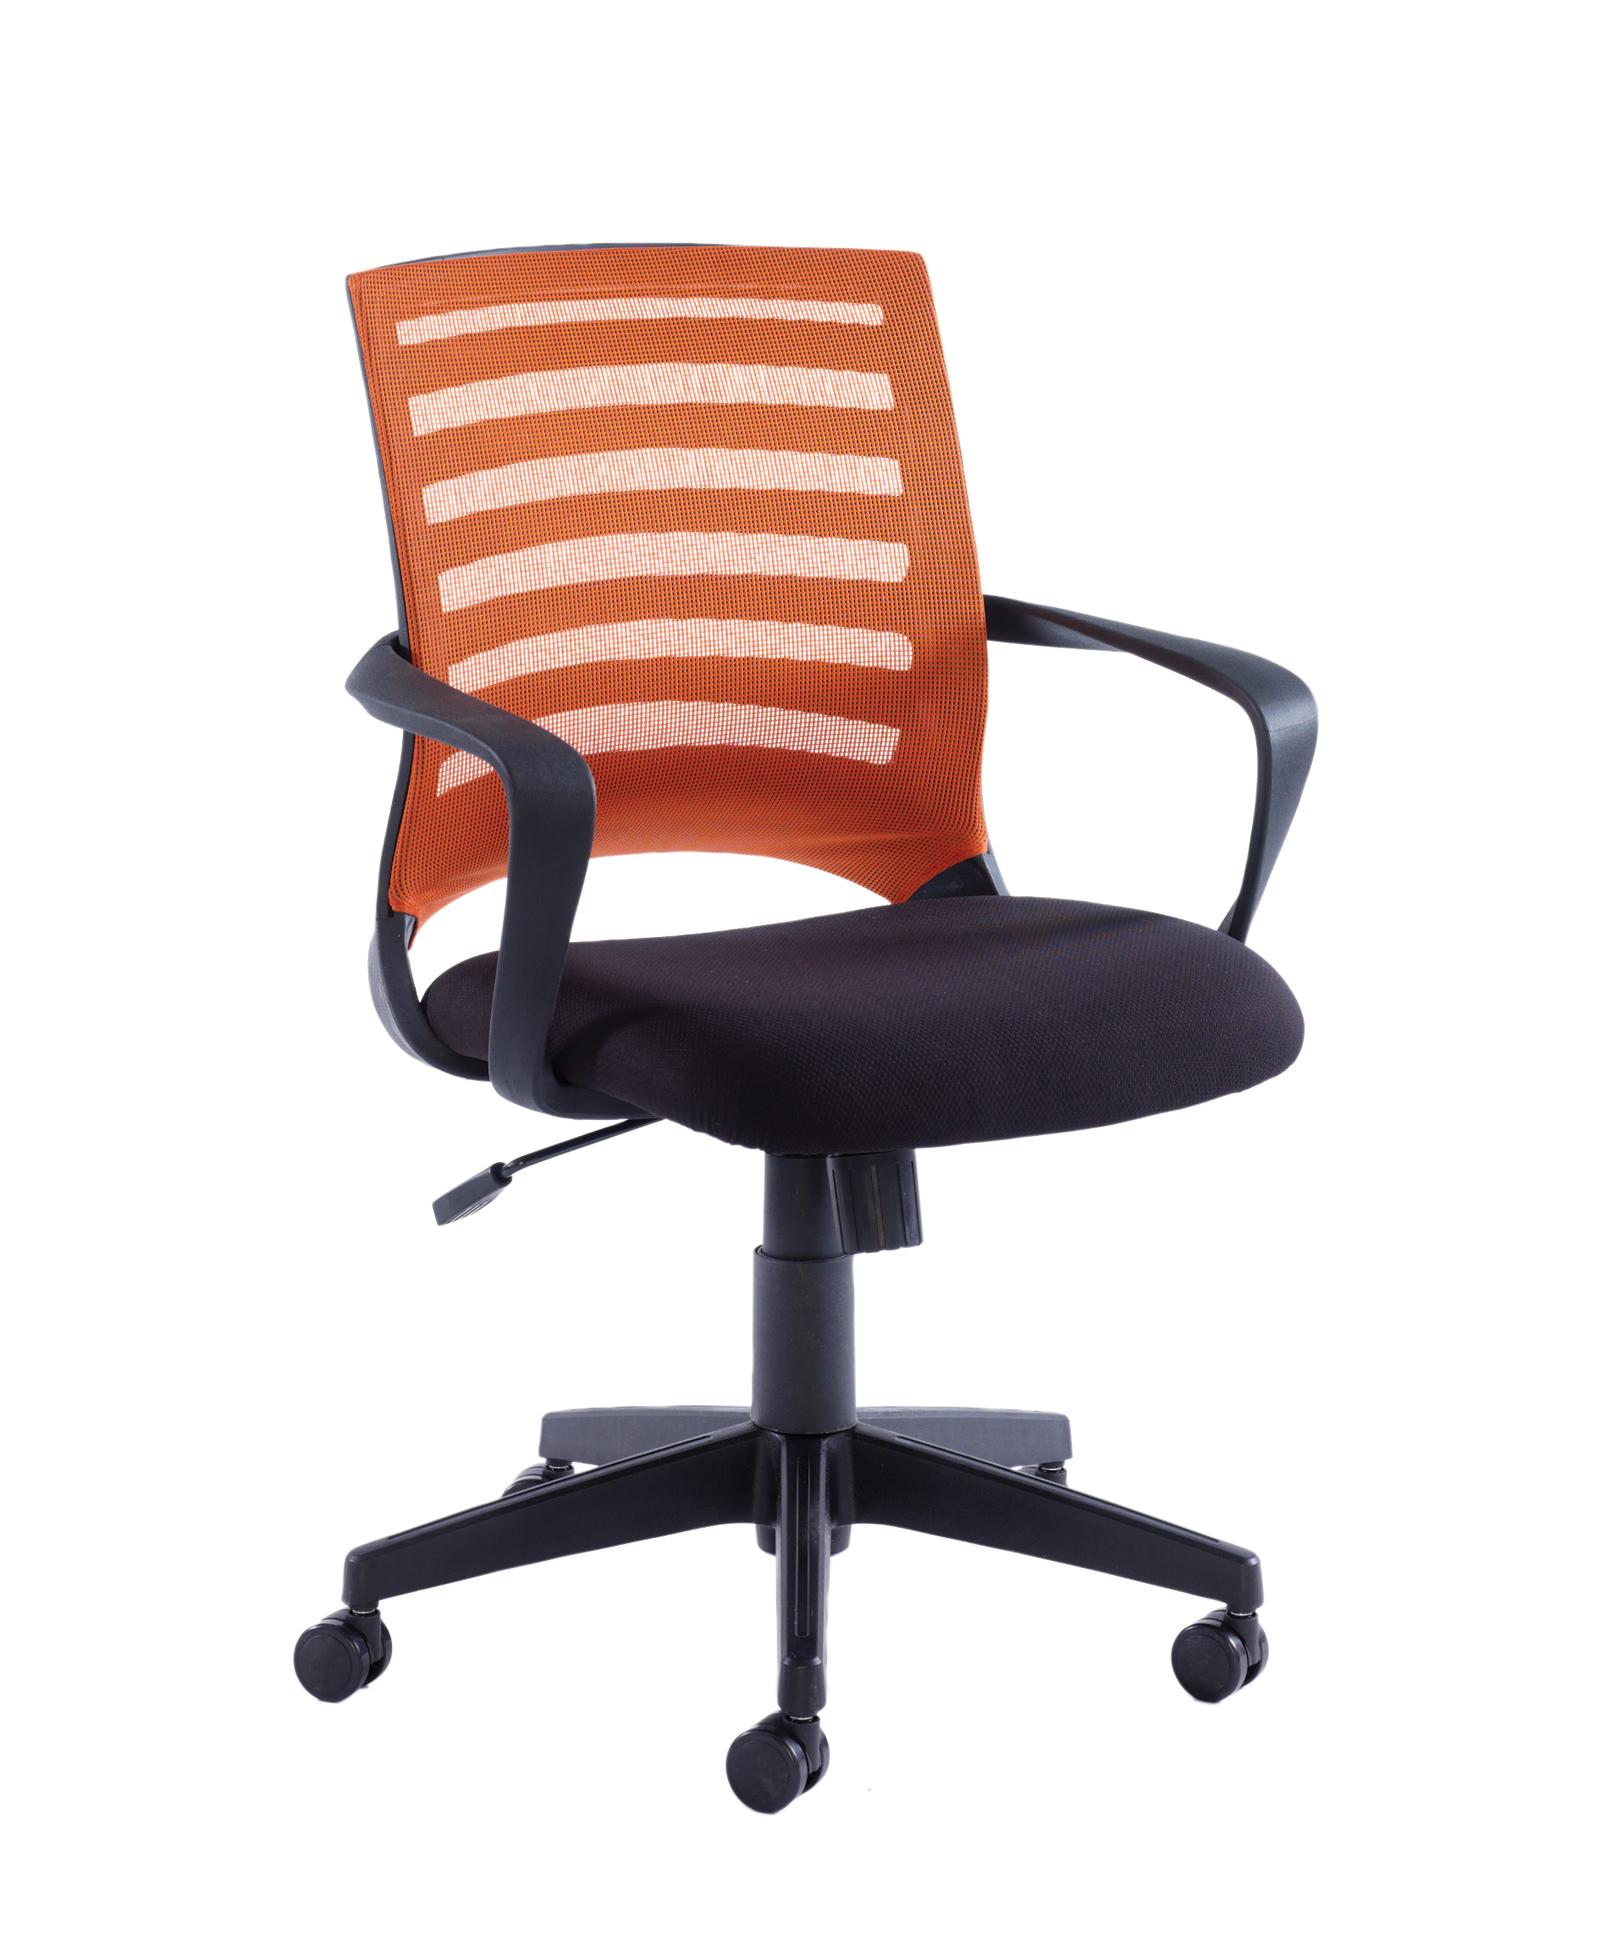 Vega Fabric Seat Mesh Back Operator Chair Fixed Arms Orange